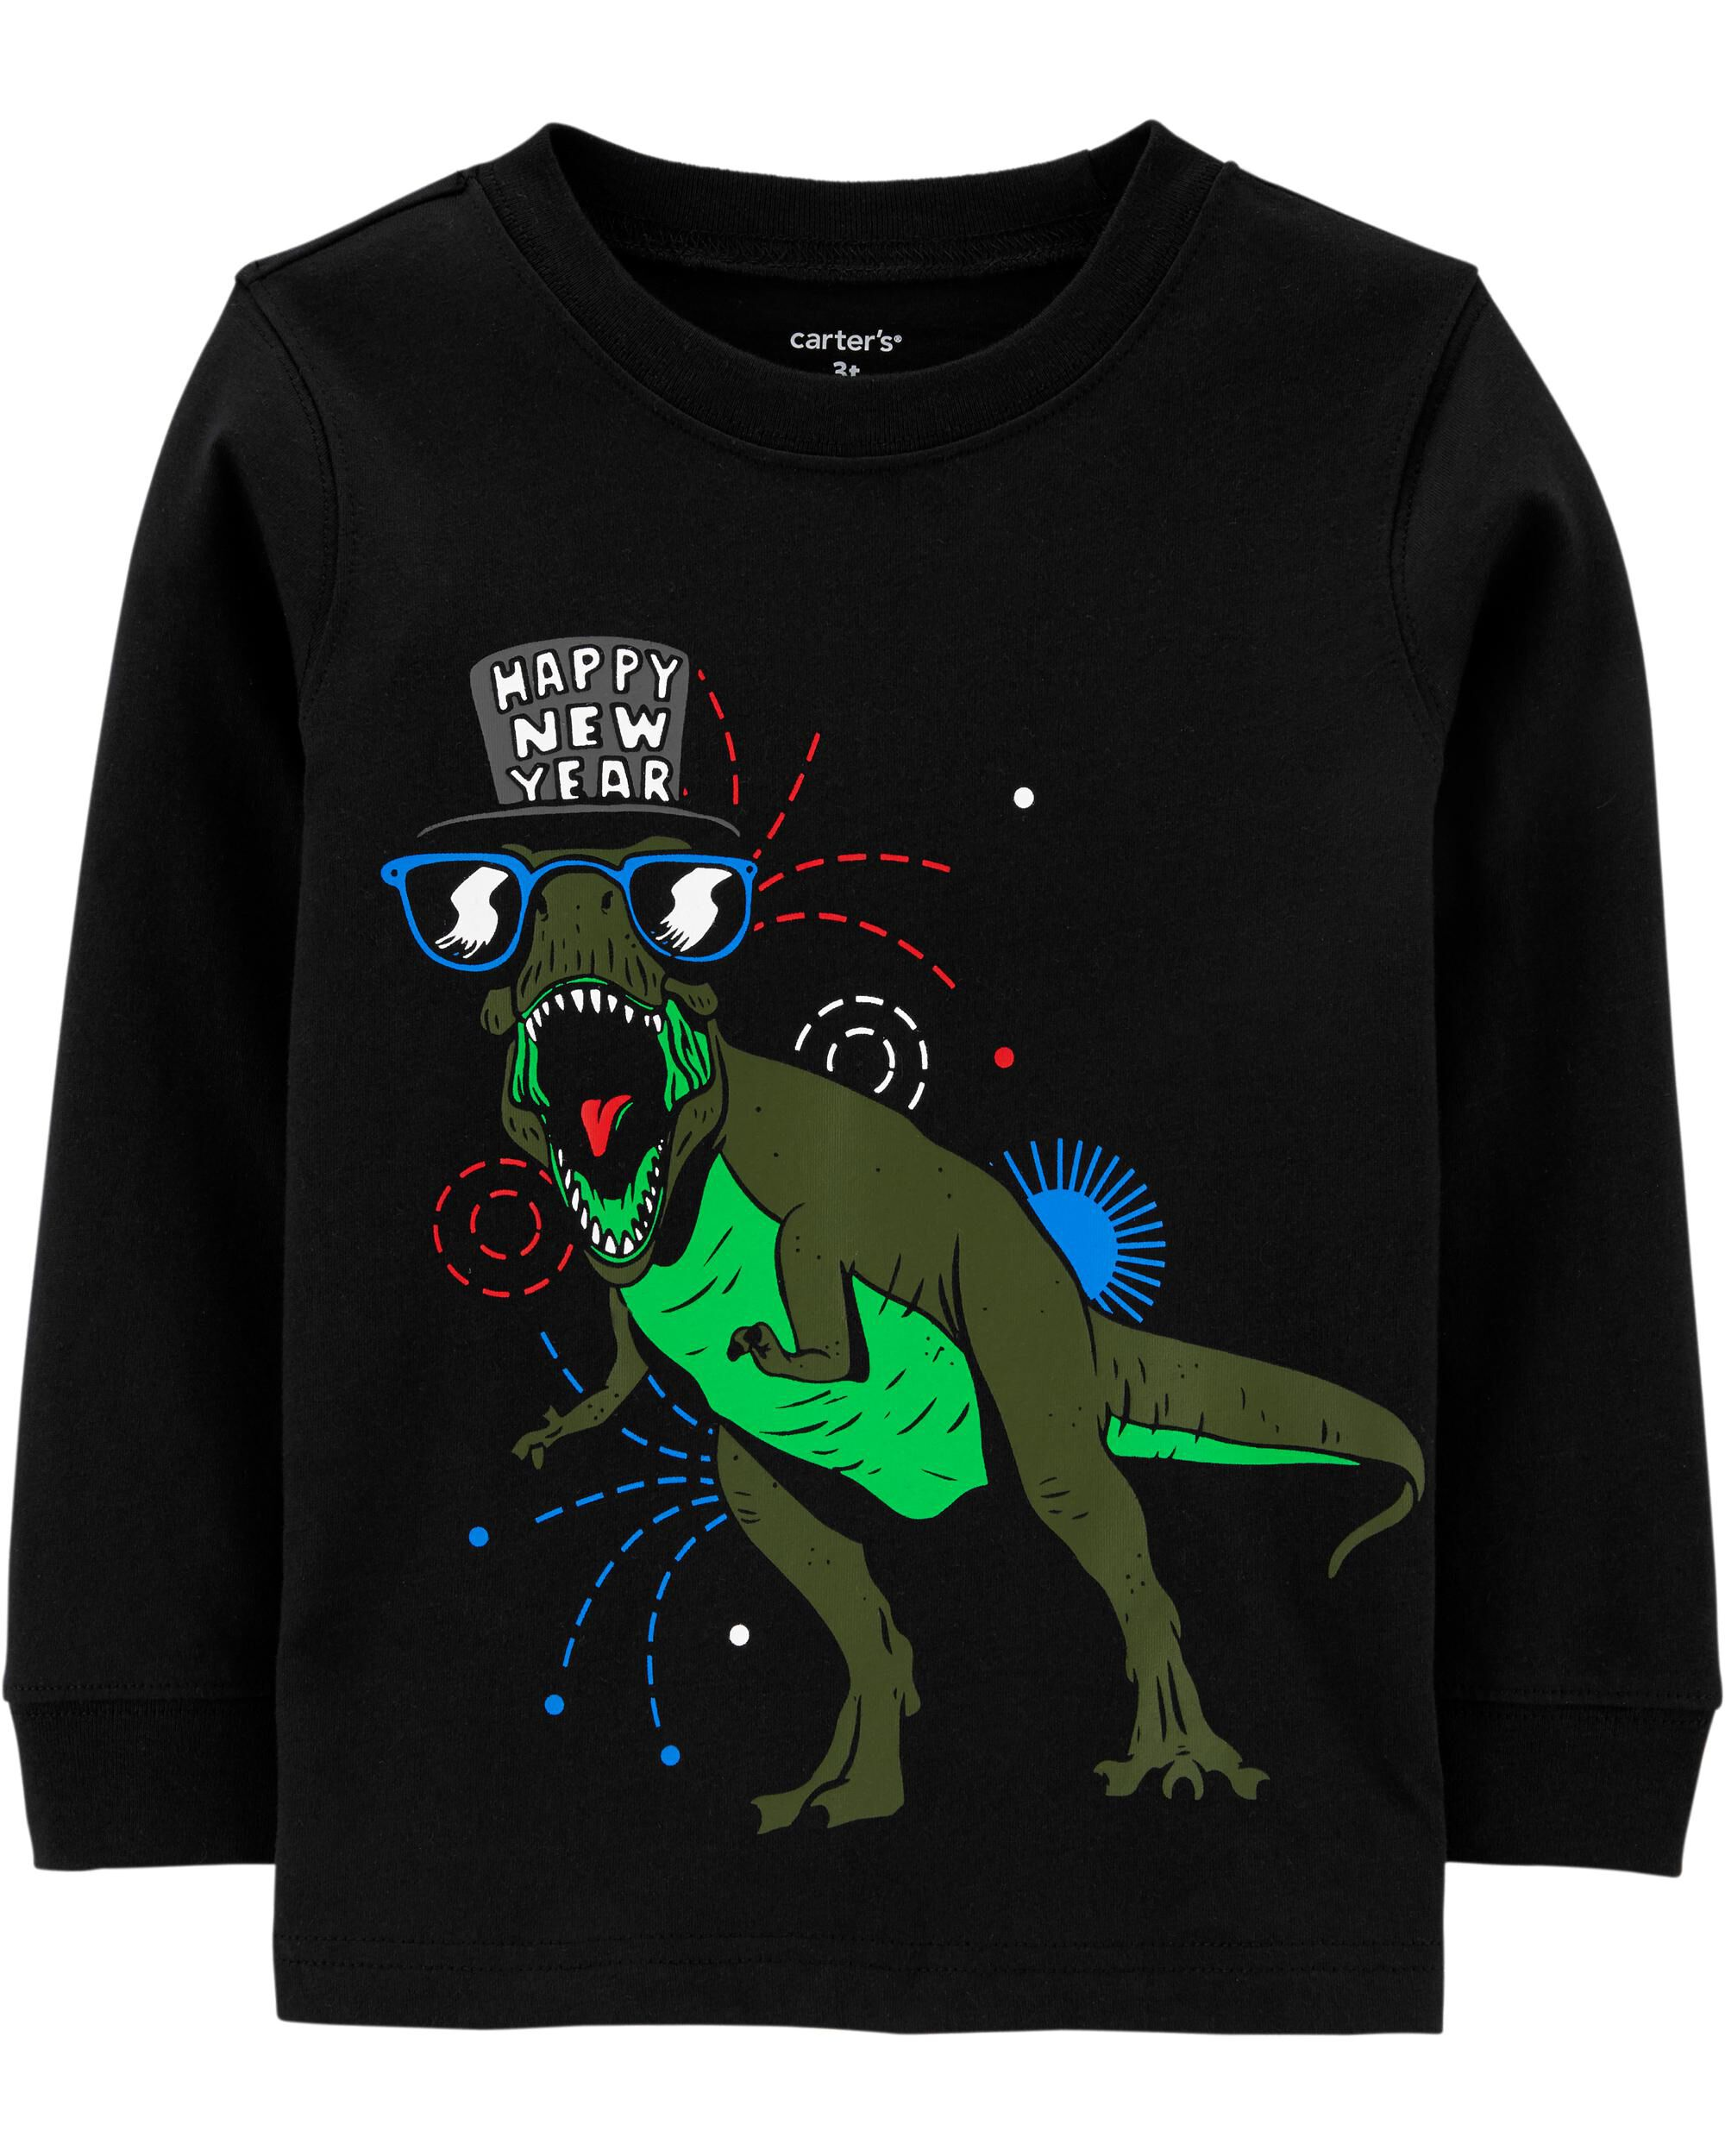 *DOORBUSTER* Dinosaur New Years Jersey Tee